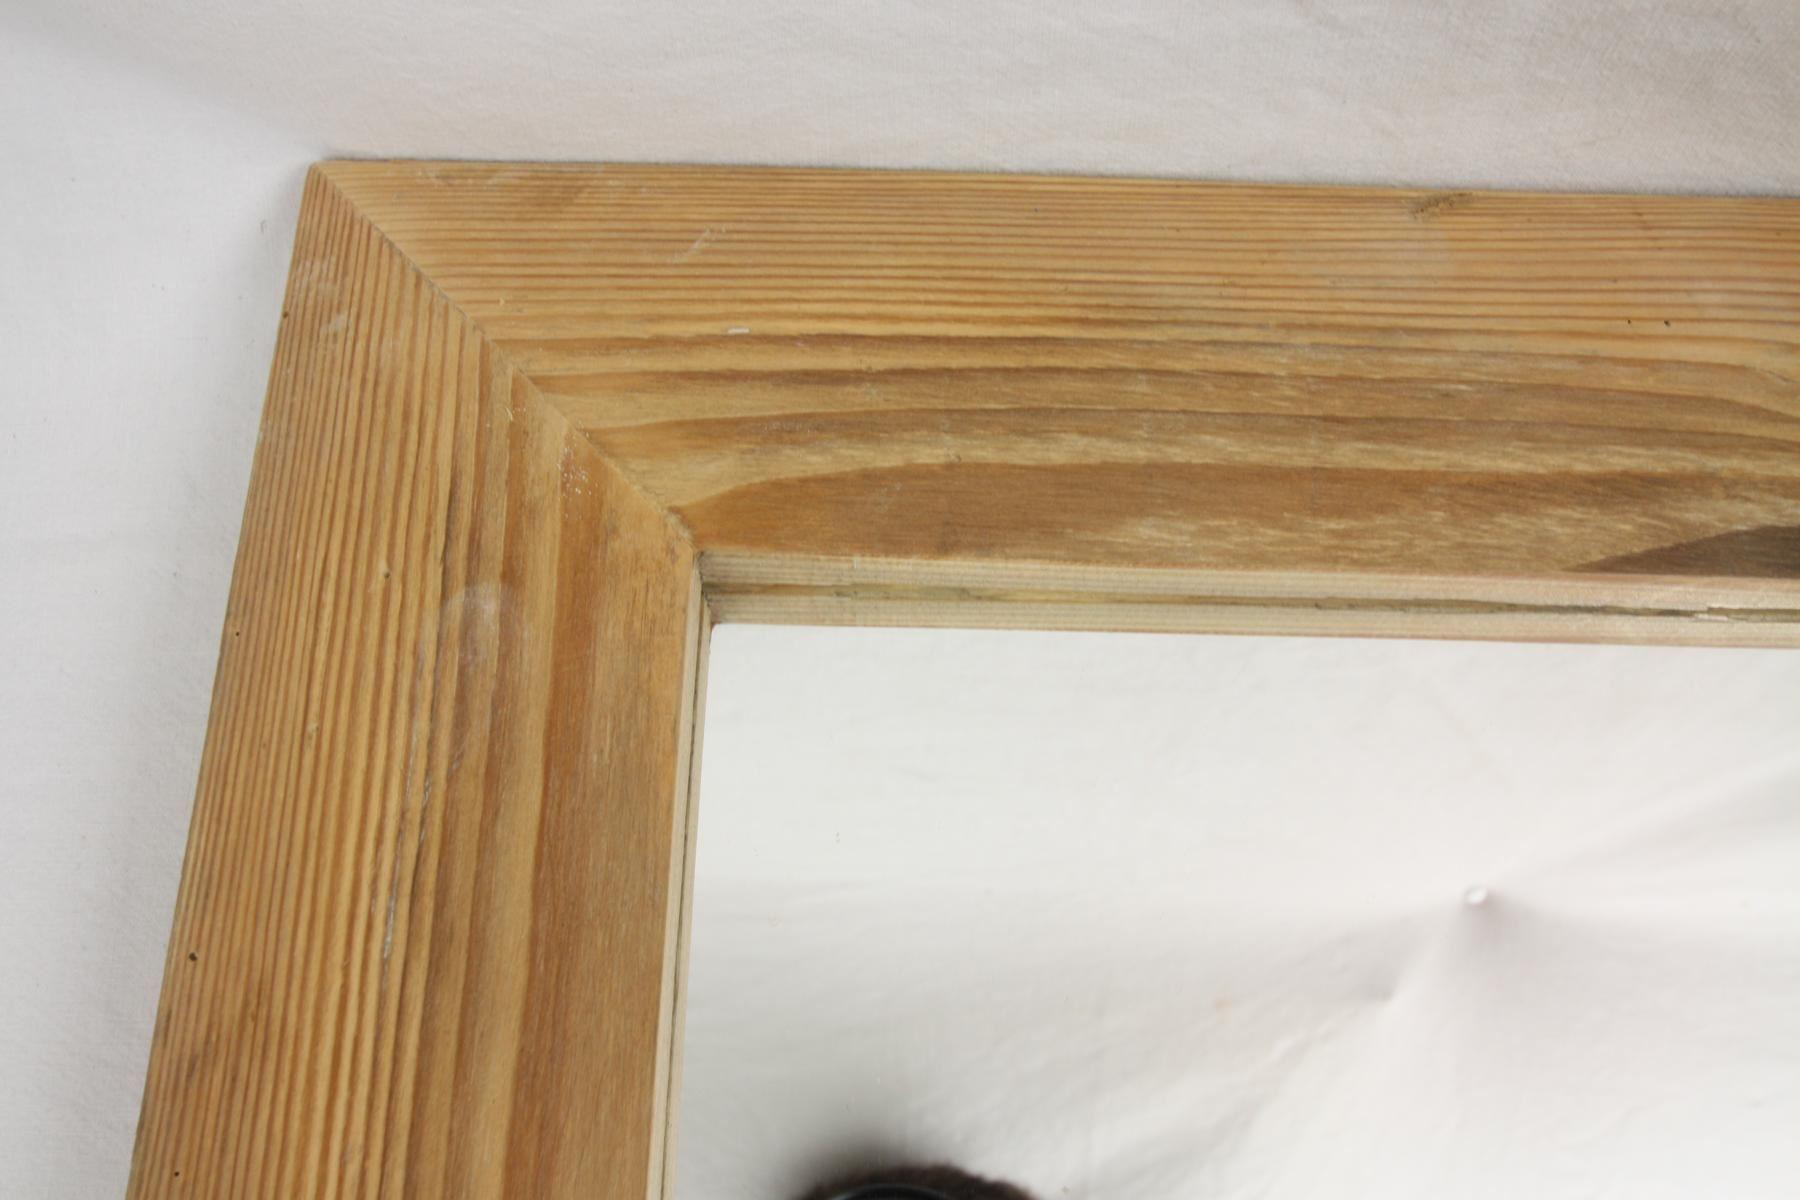 Treibholz spiegel for Rustikaler spiegel